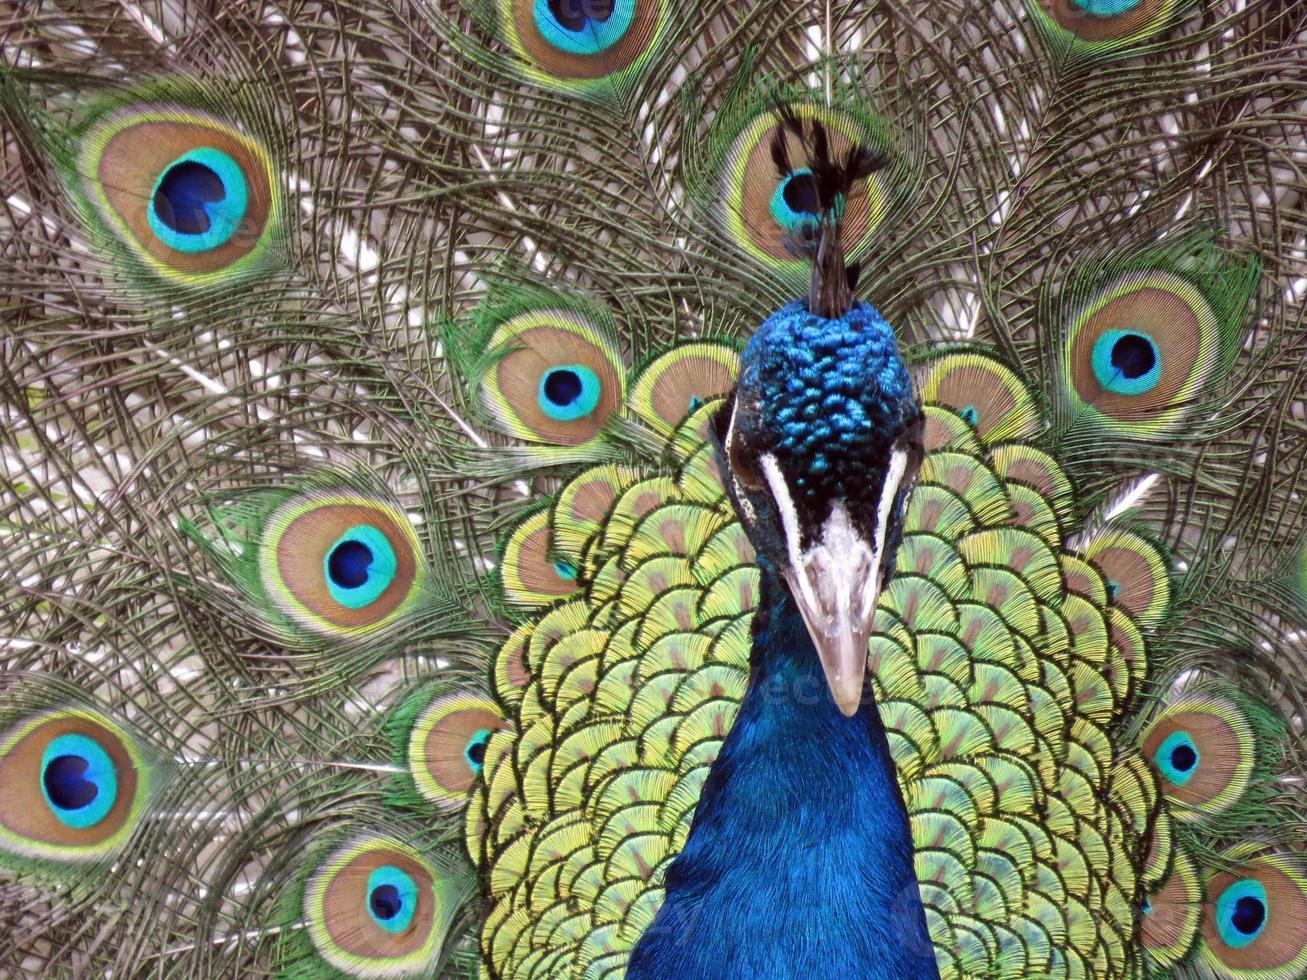 plumas de cola de pavo real foto